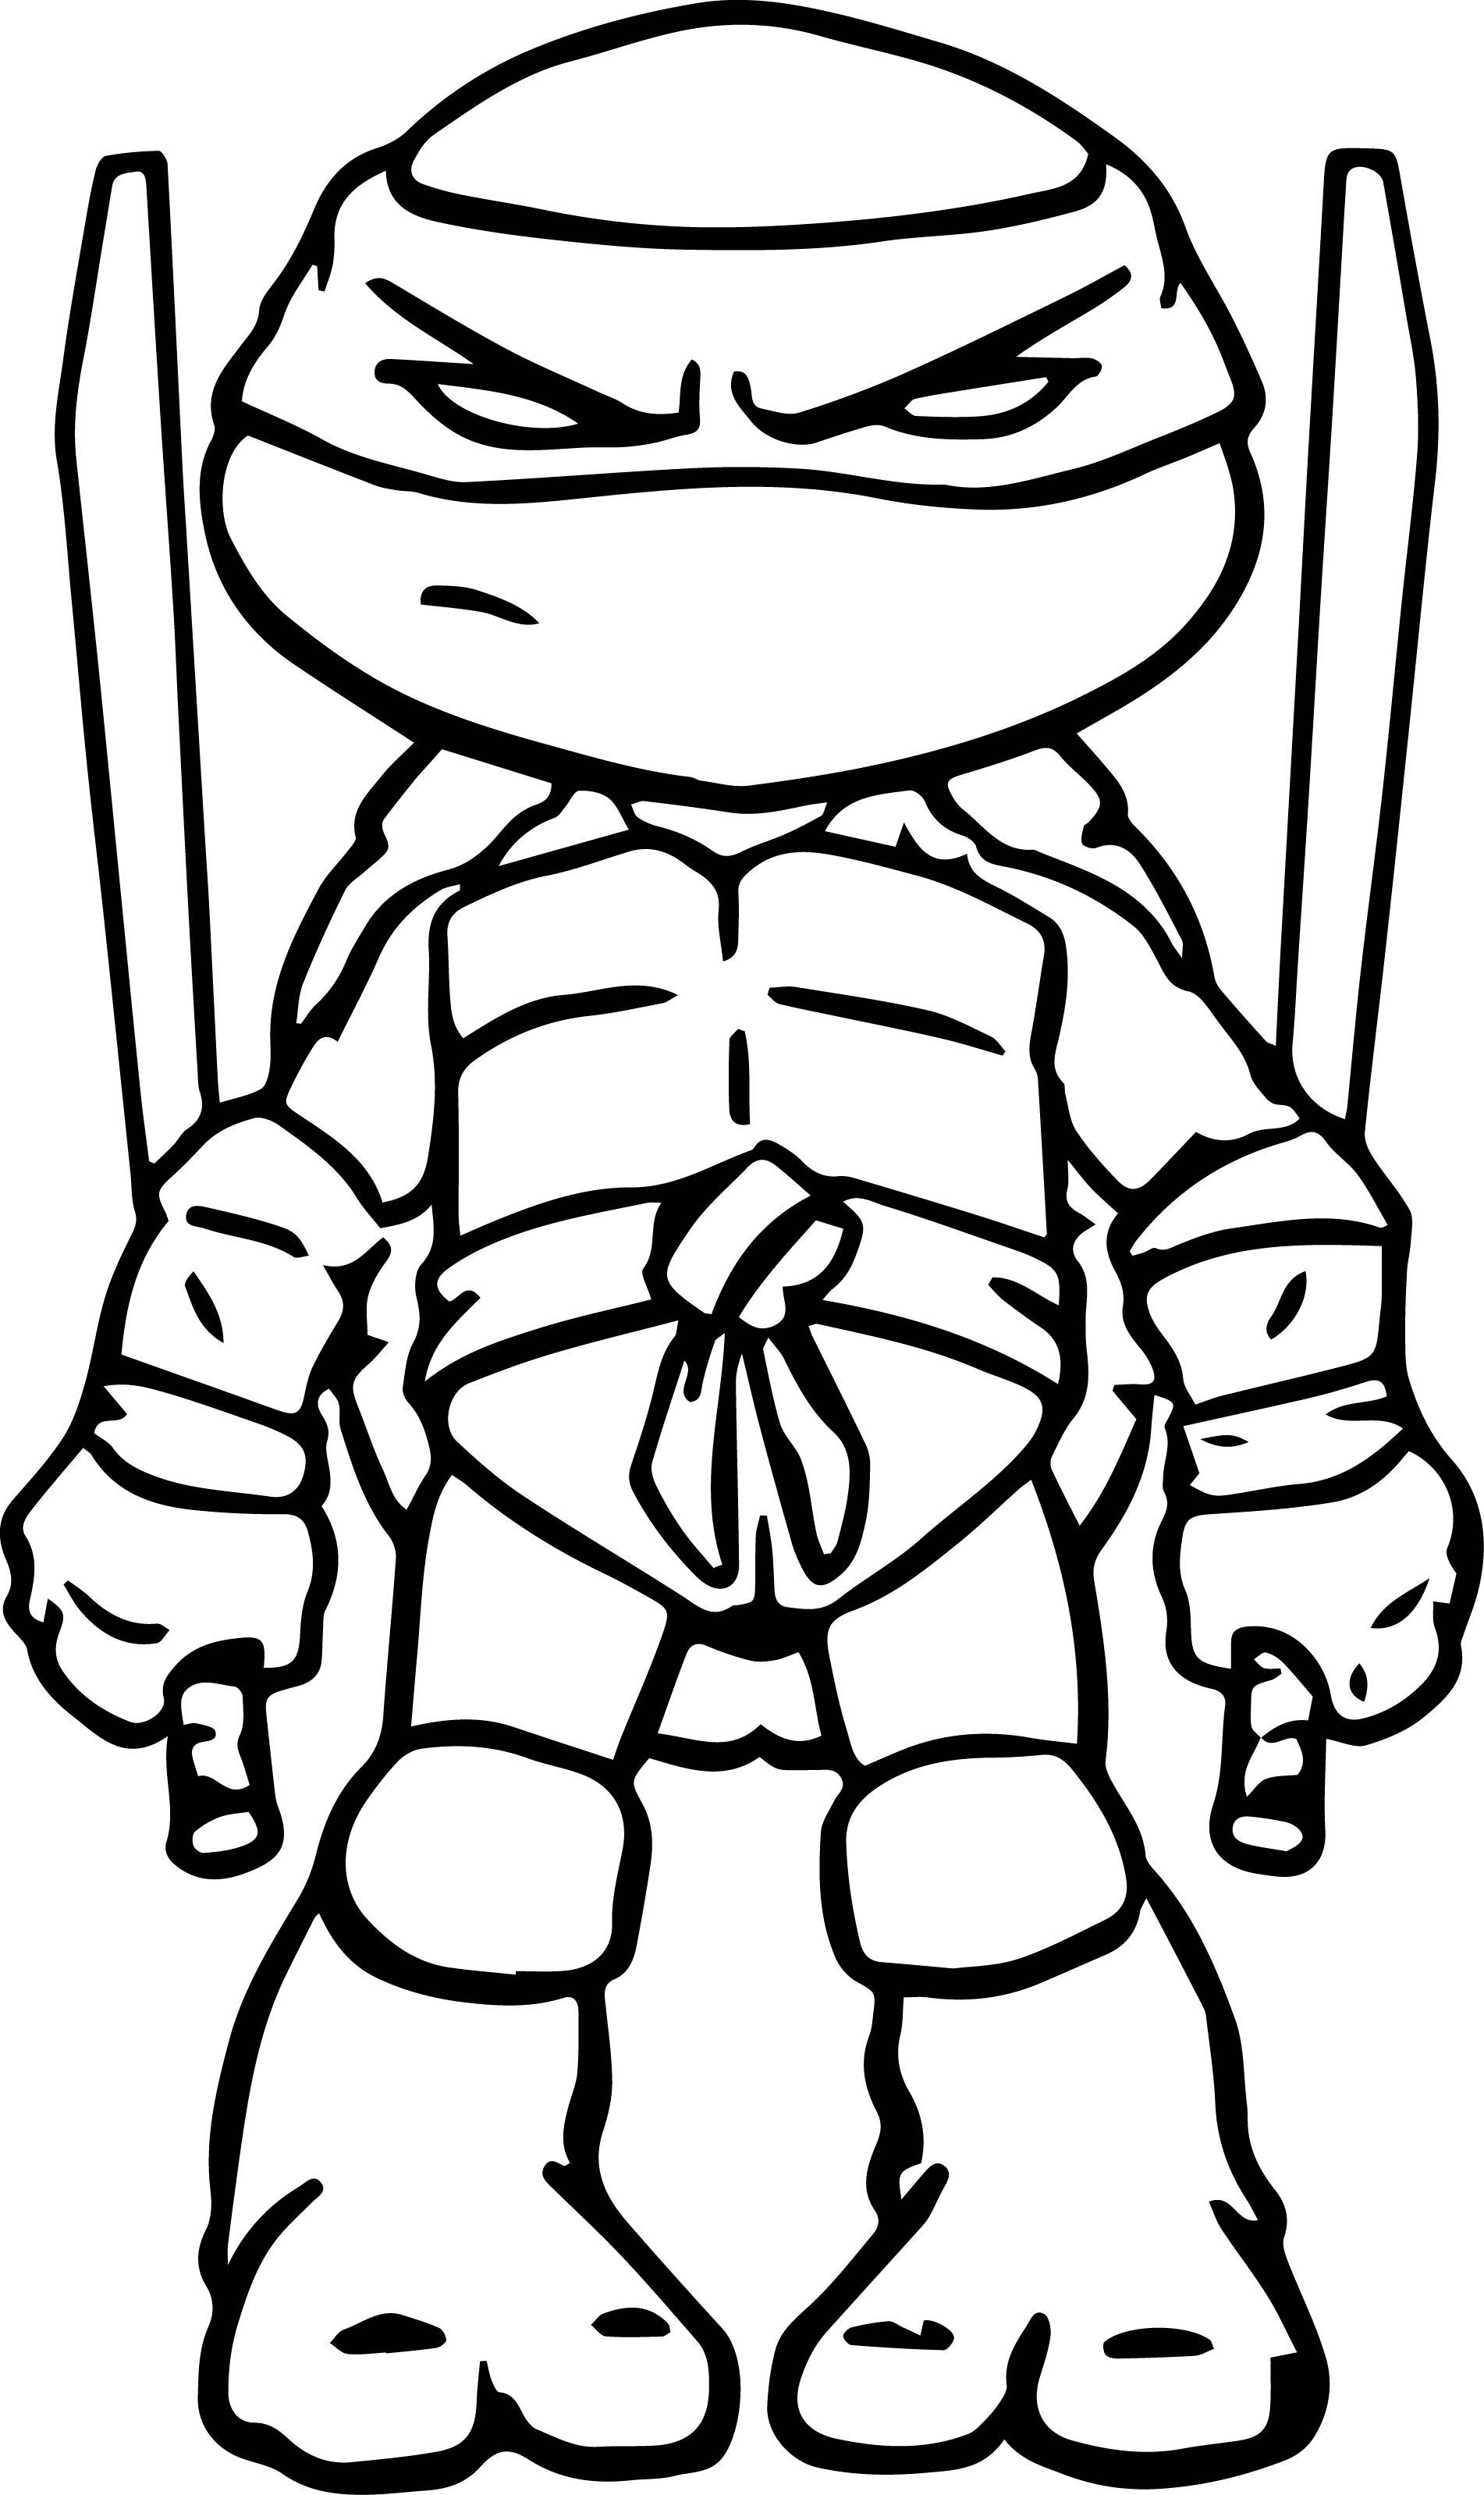 Ninja Turtles clipart black and white Page Ninja Coloring Ninja Turtles